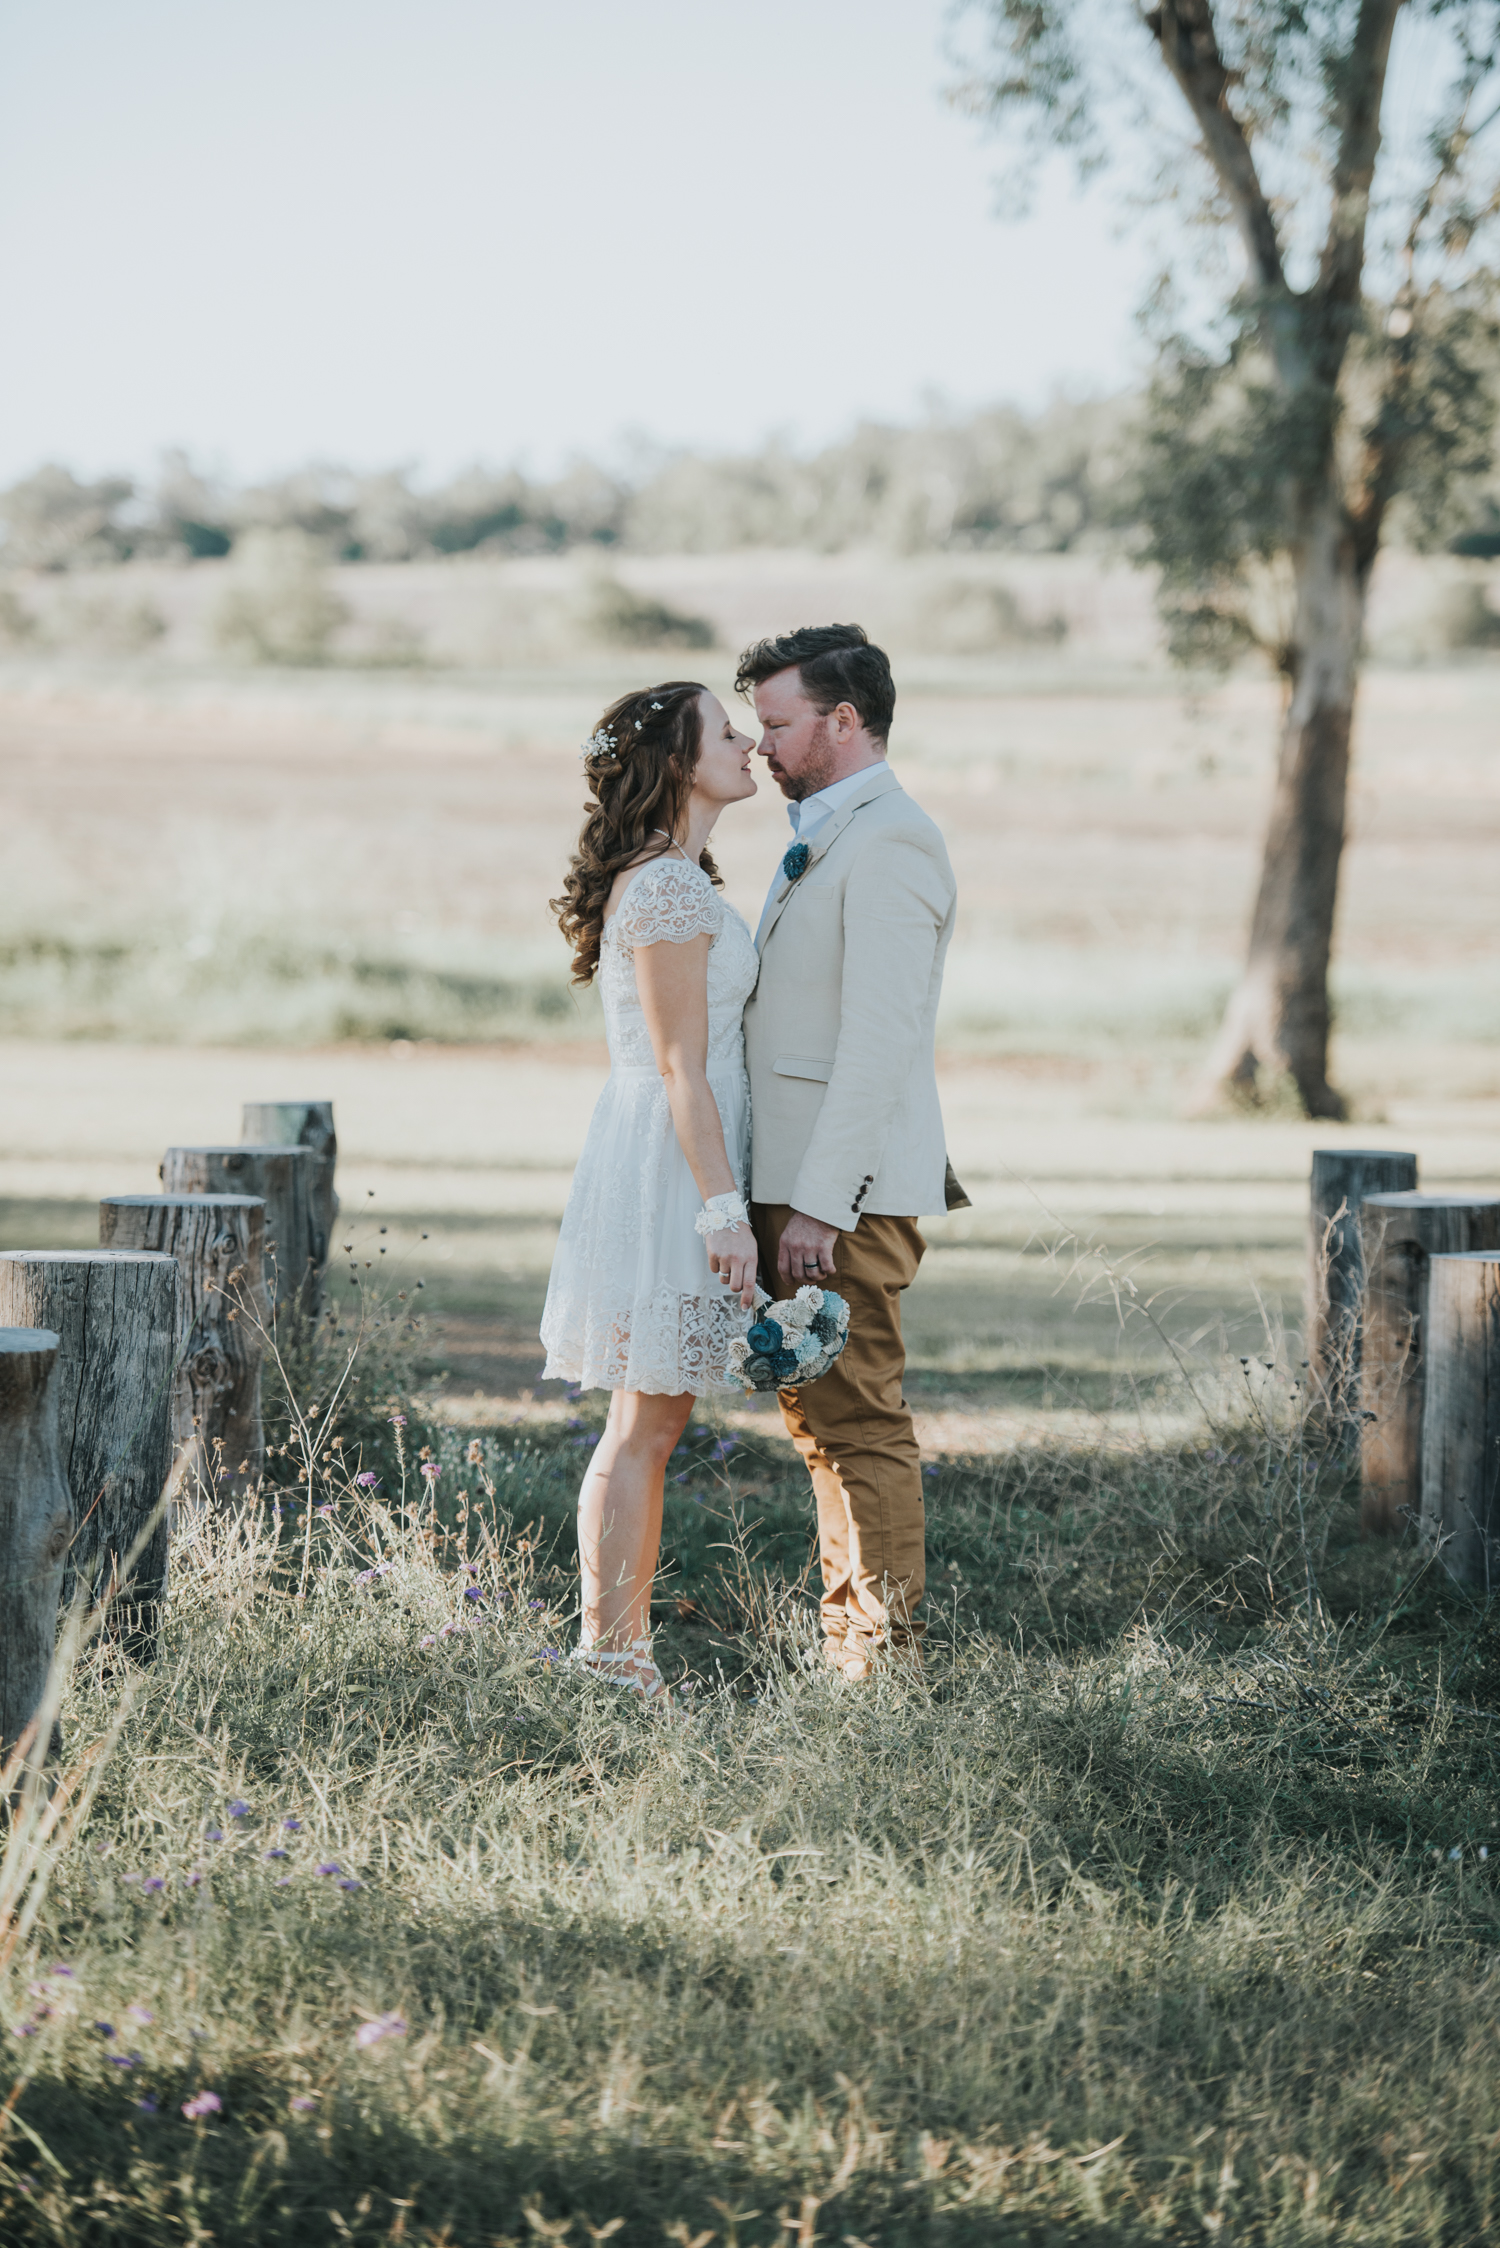 Brisbane Wedding Photographer | Engagement Photography-47.jpg